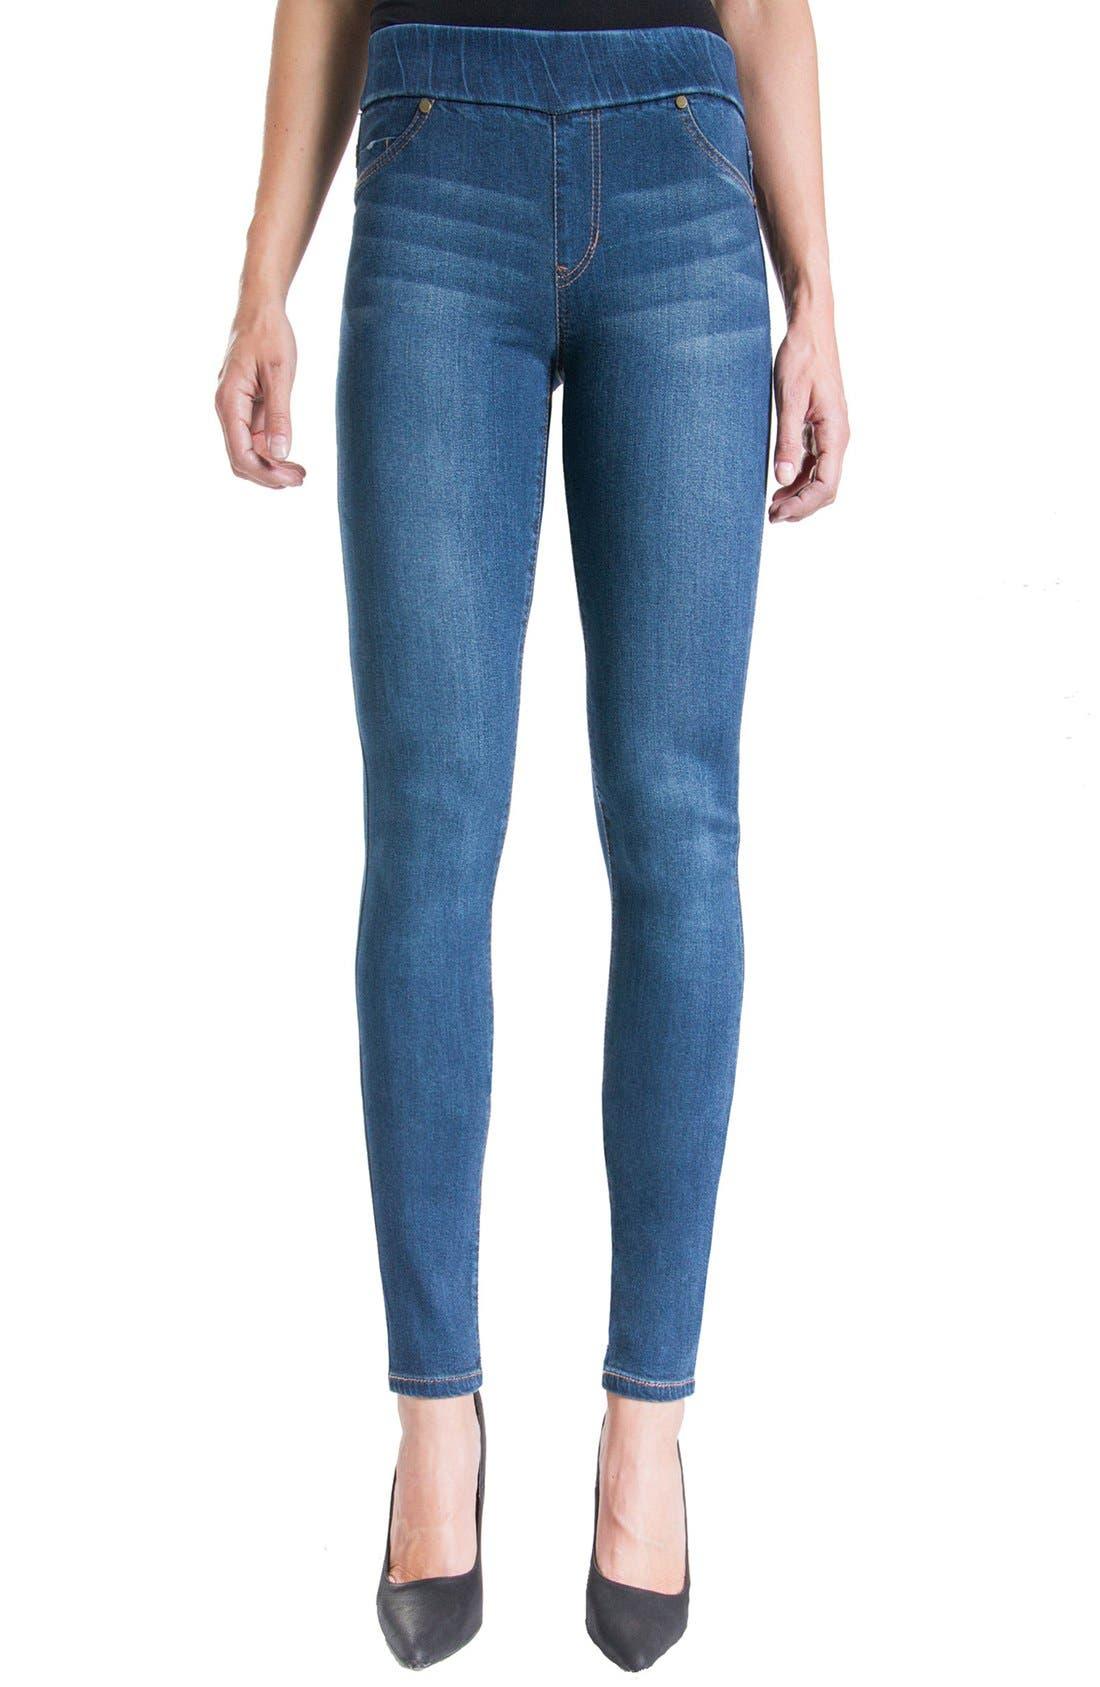 Jeans Company Sienna Mid Rise Soft Stretch Denim Leggings,                             Main thumbnail 2, color,